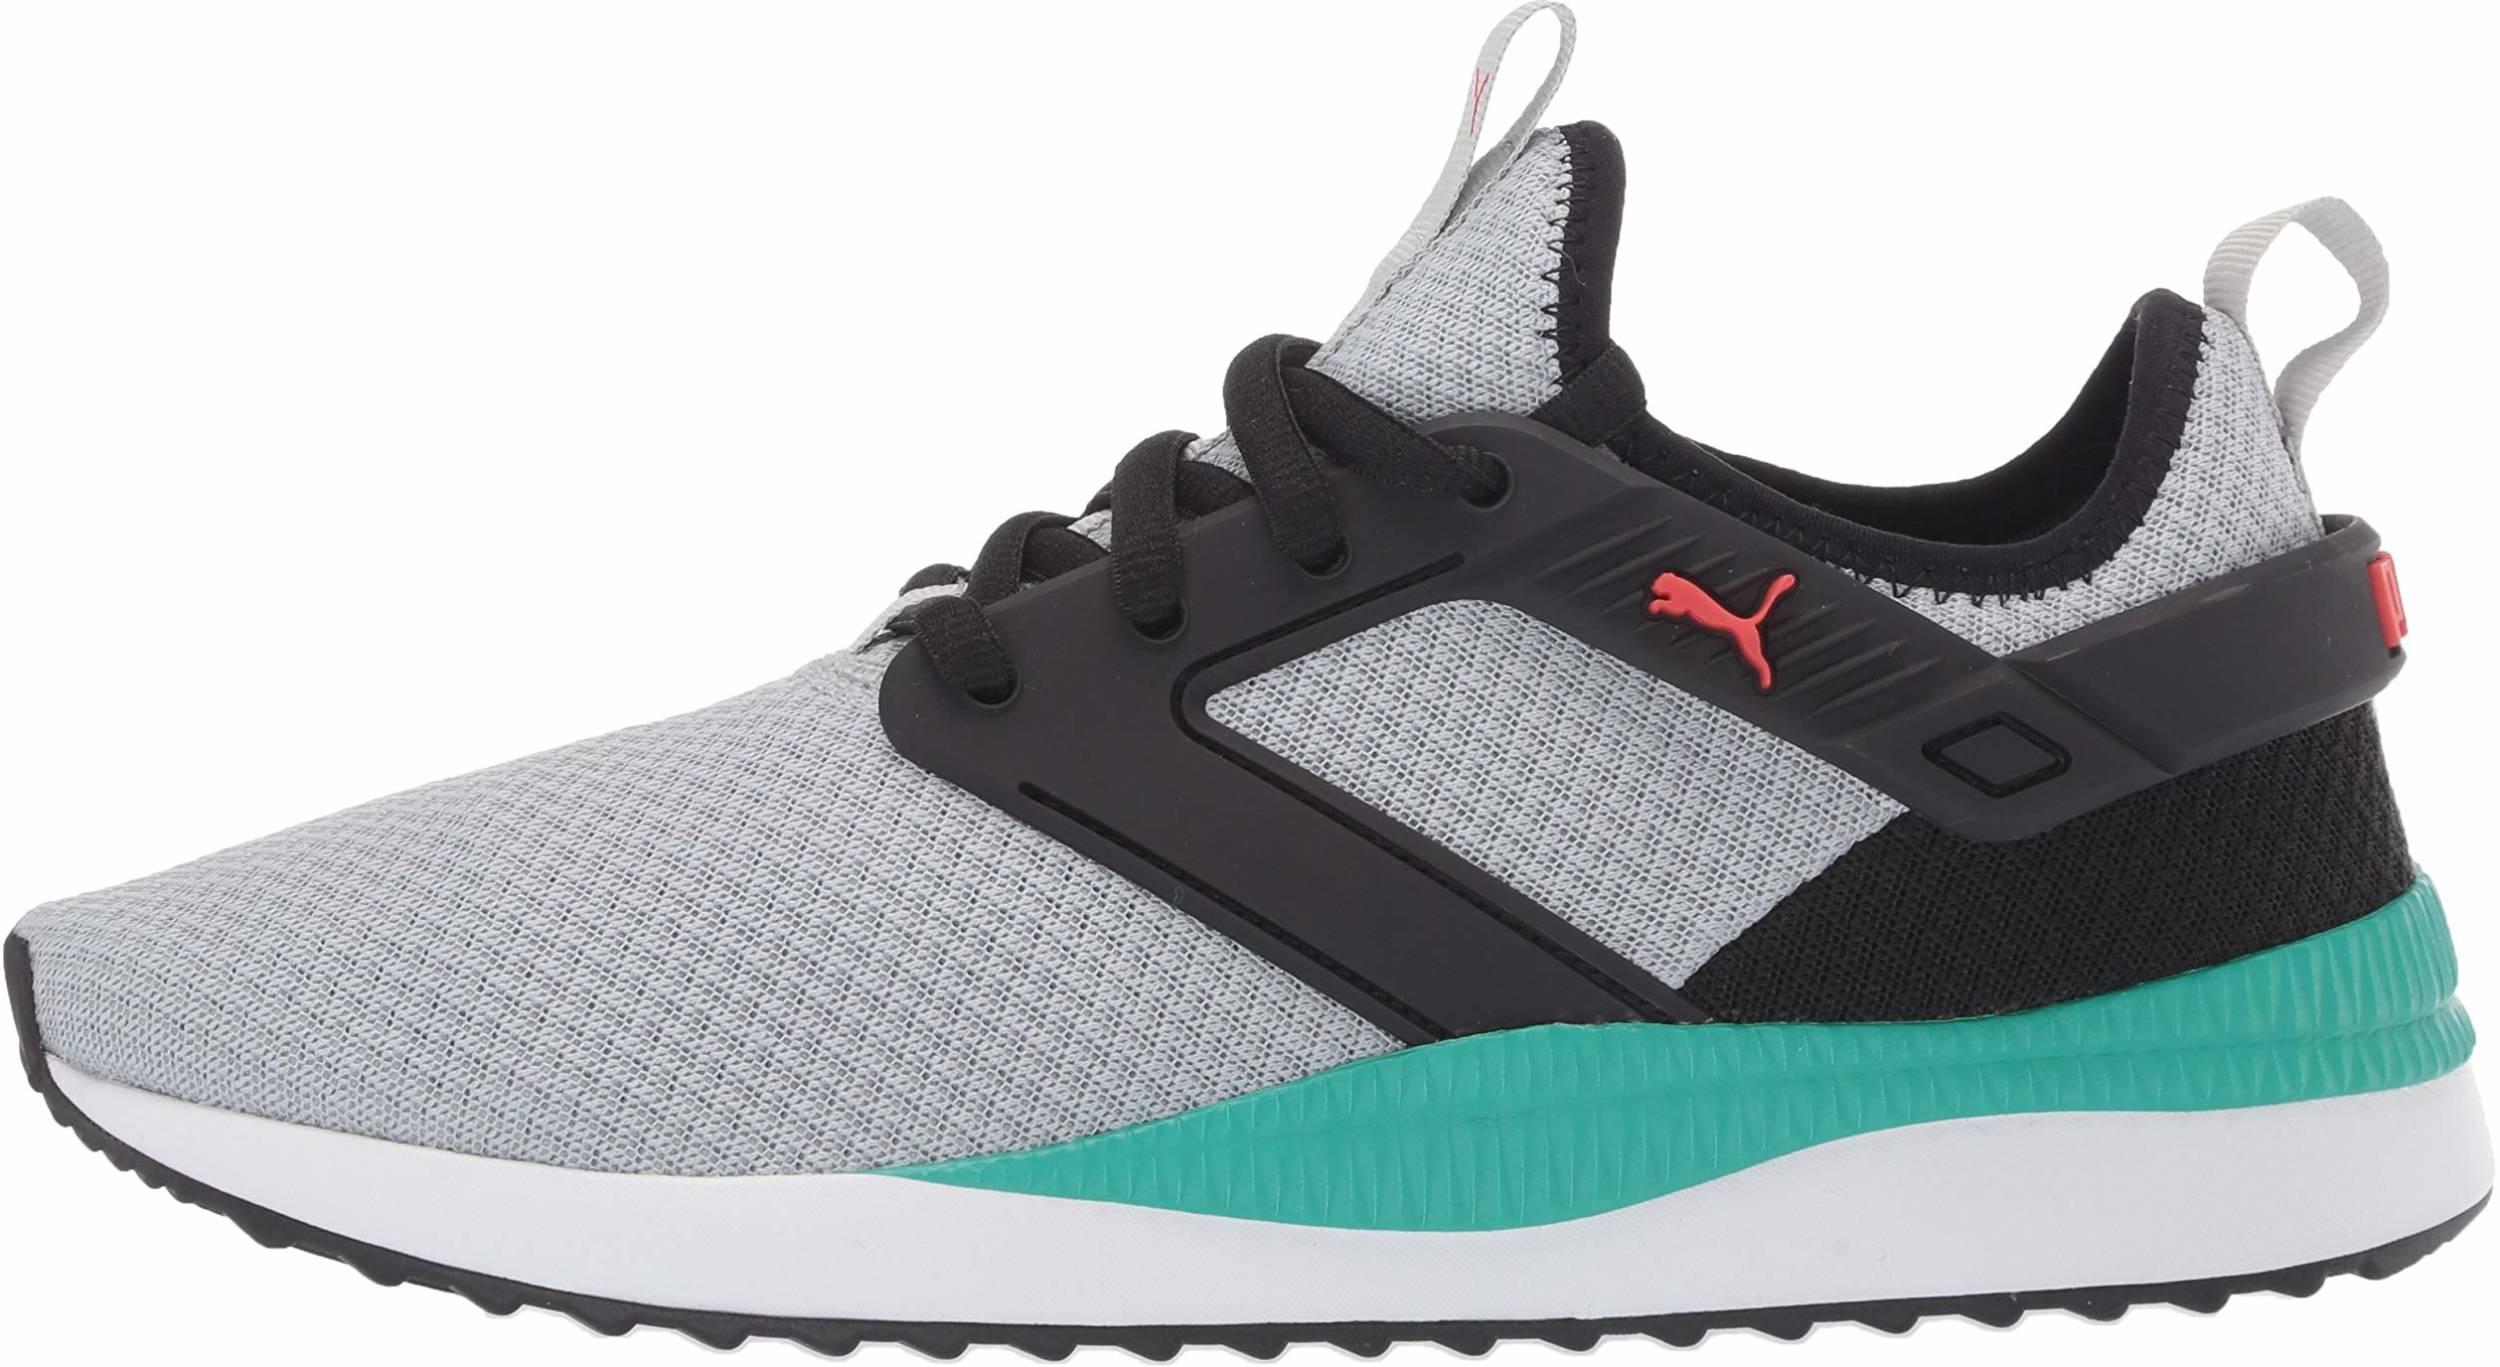 Save 57% on Puma Classics Sneakers (43